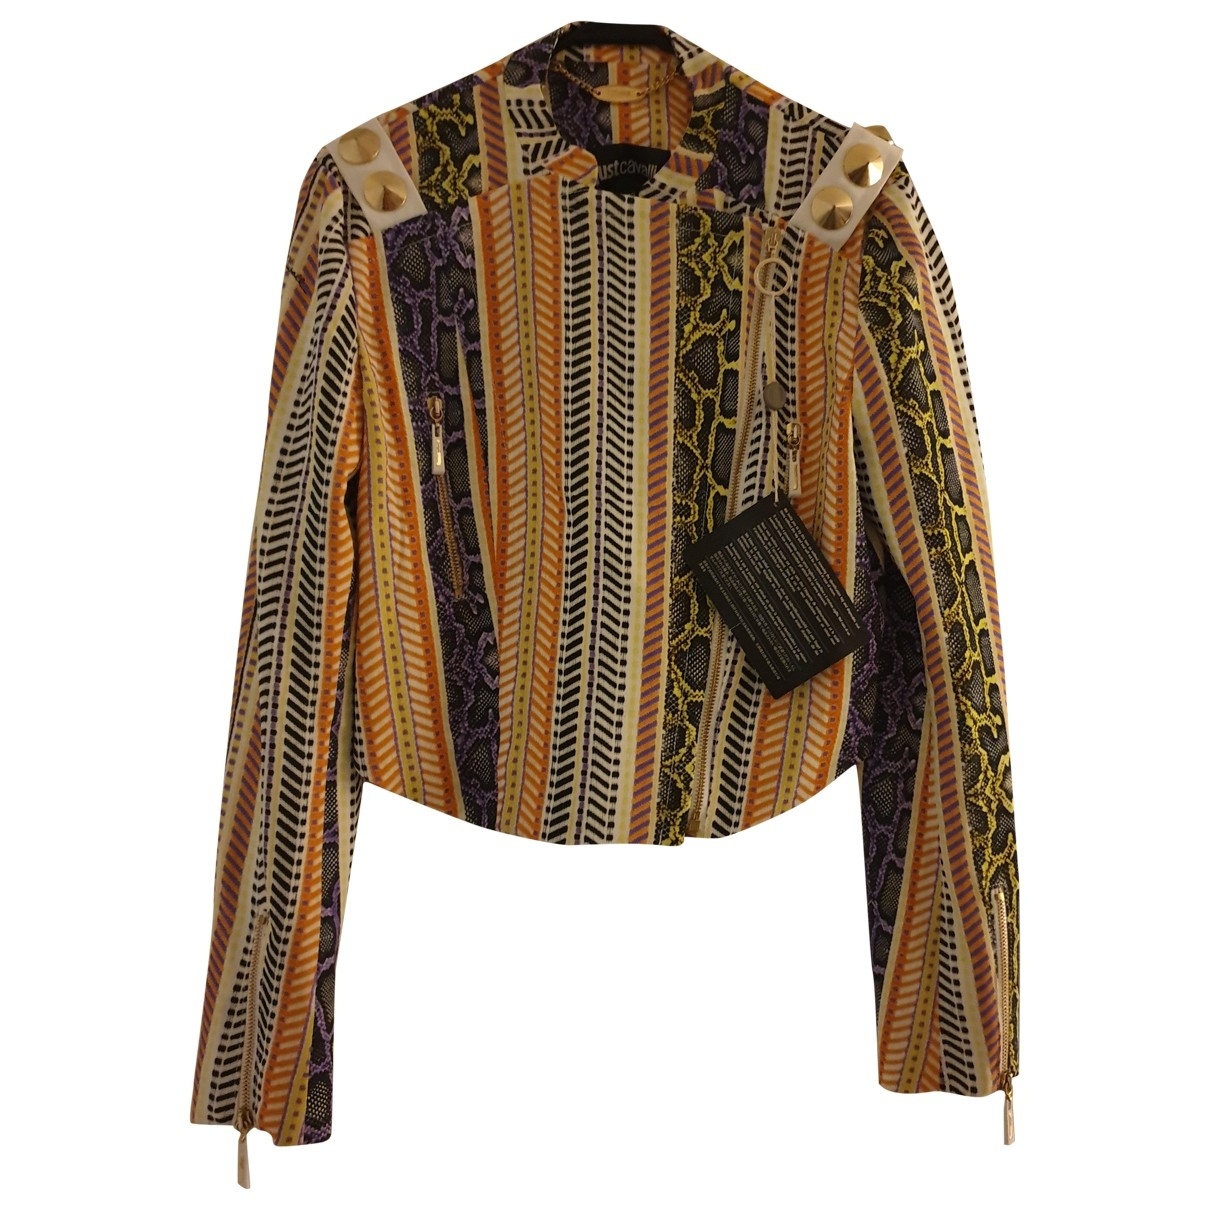 Just Cavalli \N Multicolour jacket for Women 42 IT